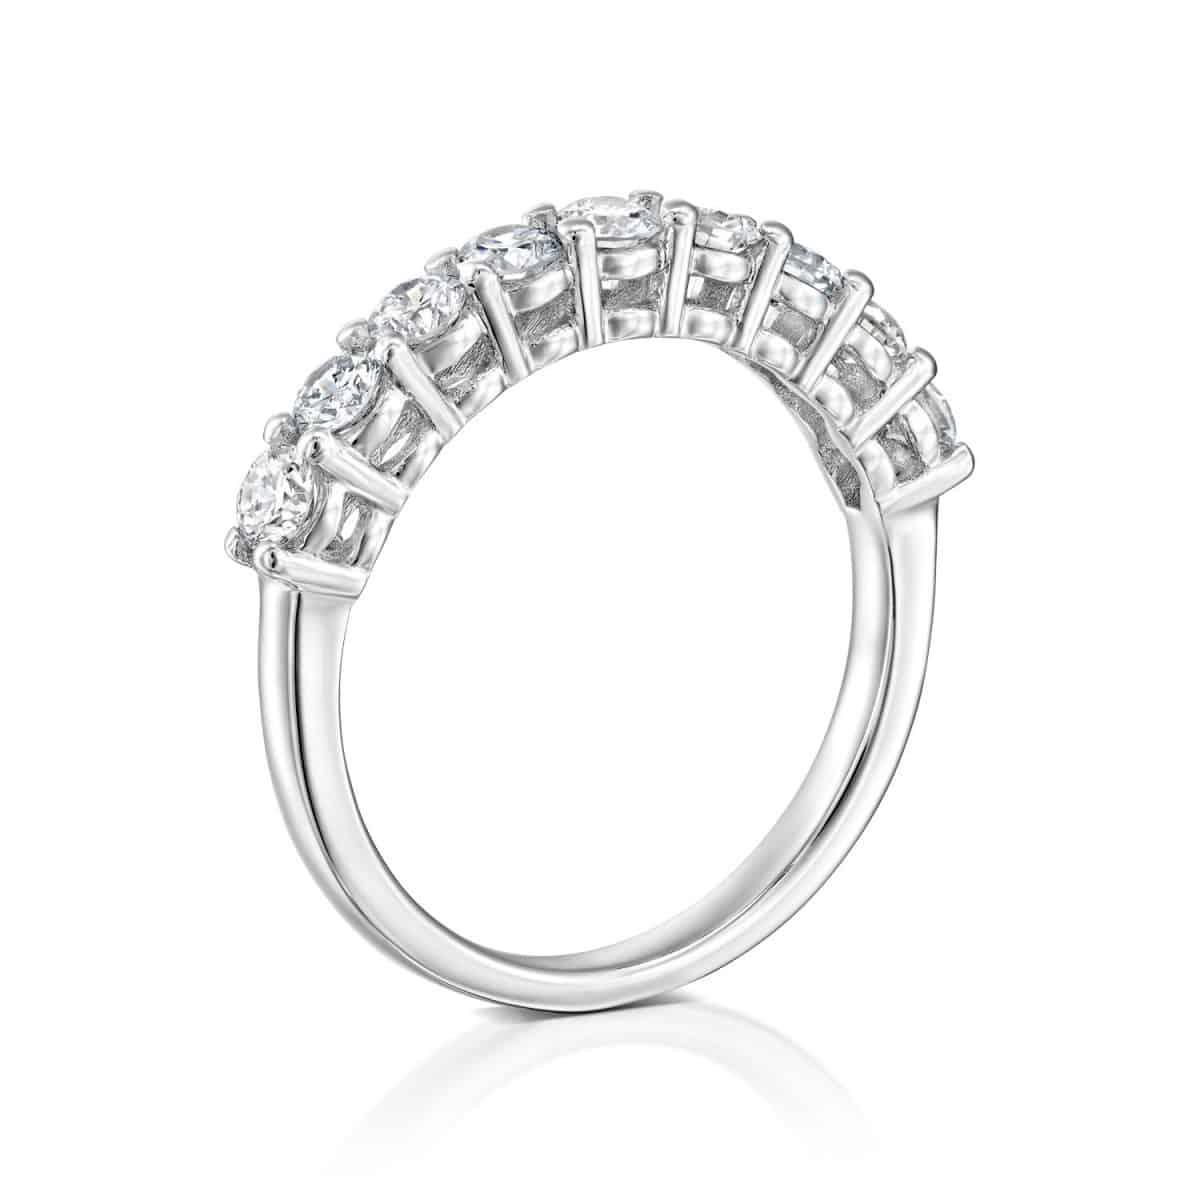 Inlay Lab Grown Diamond Engagement Ring 0.85ct. - standing